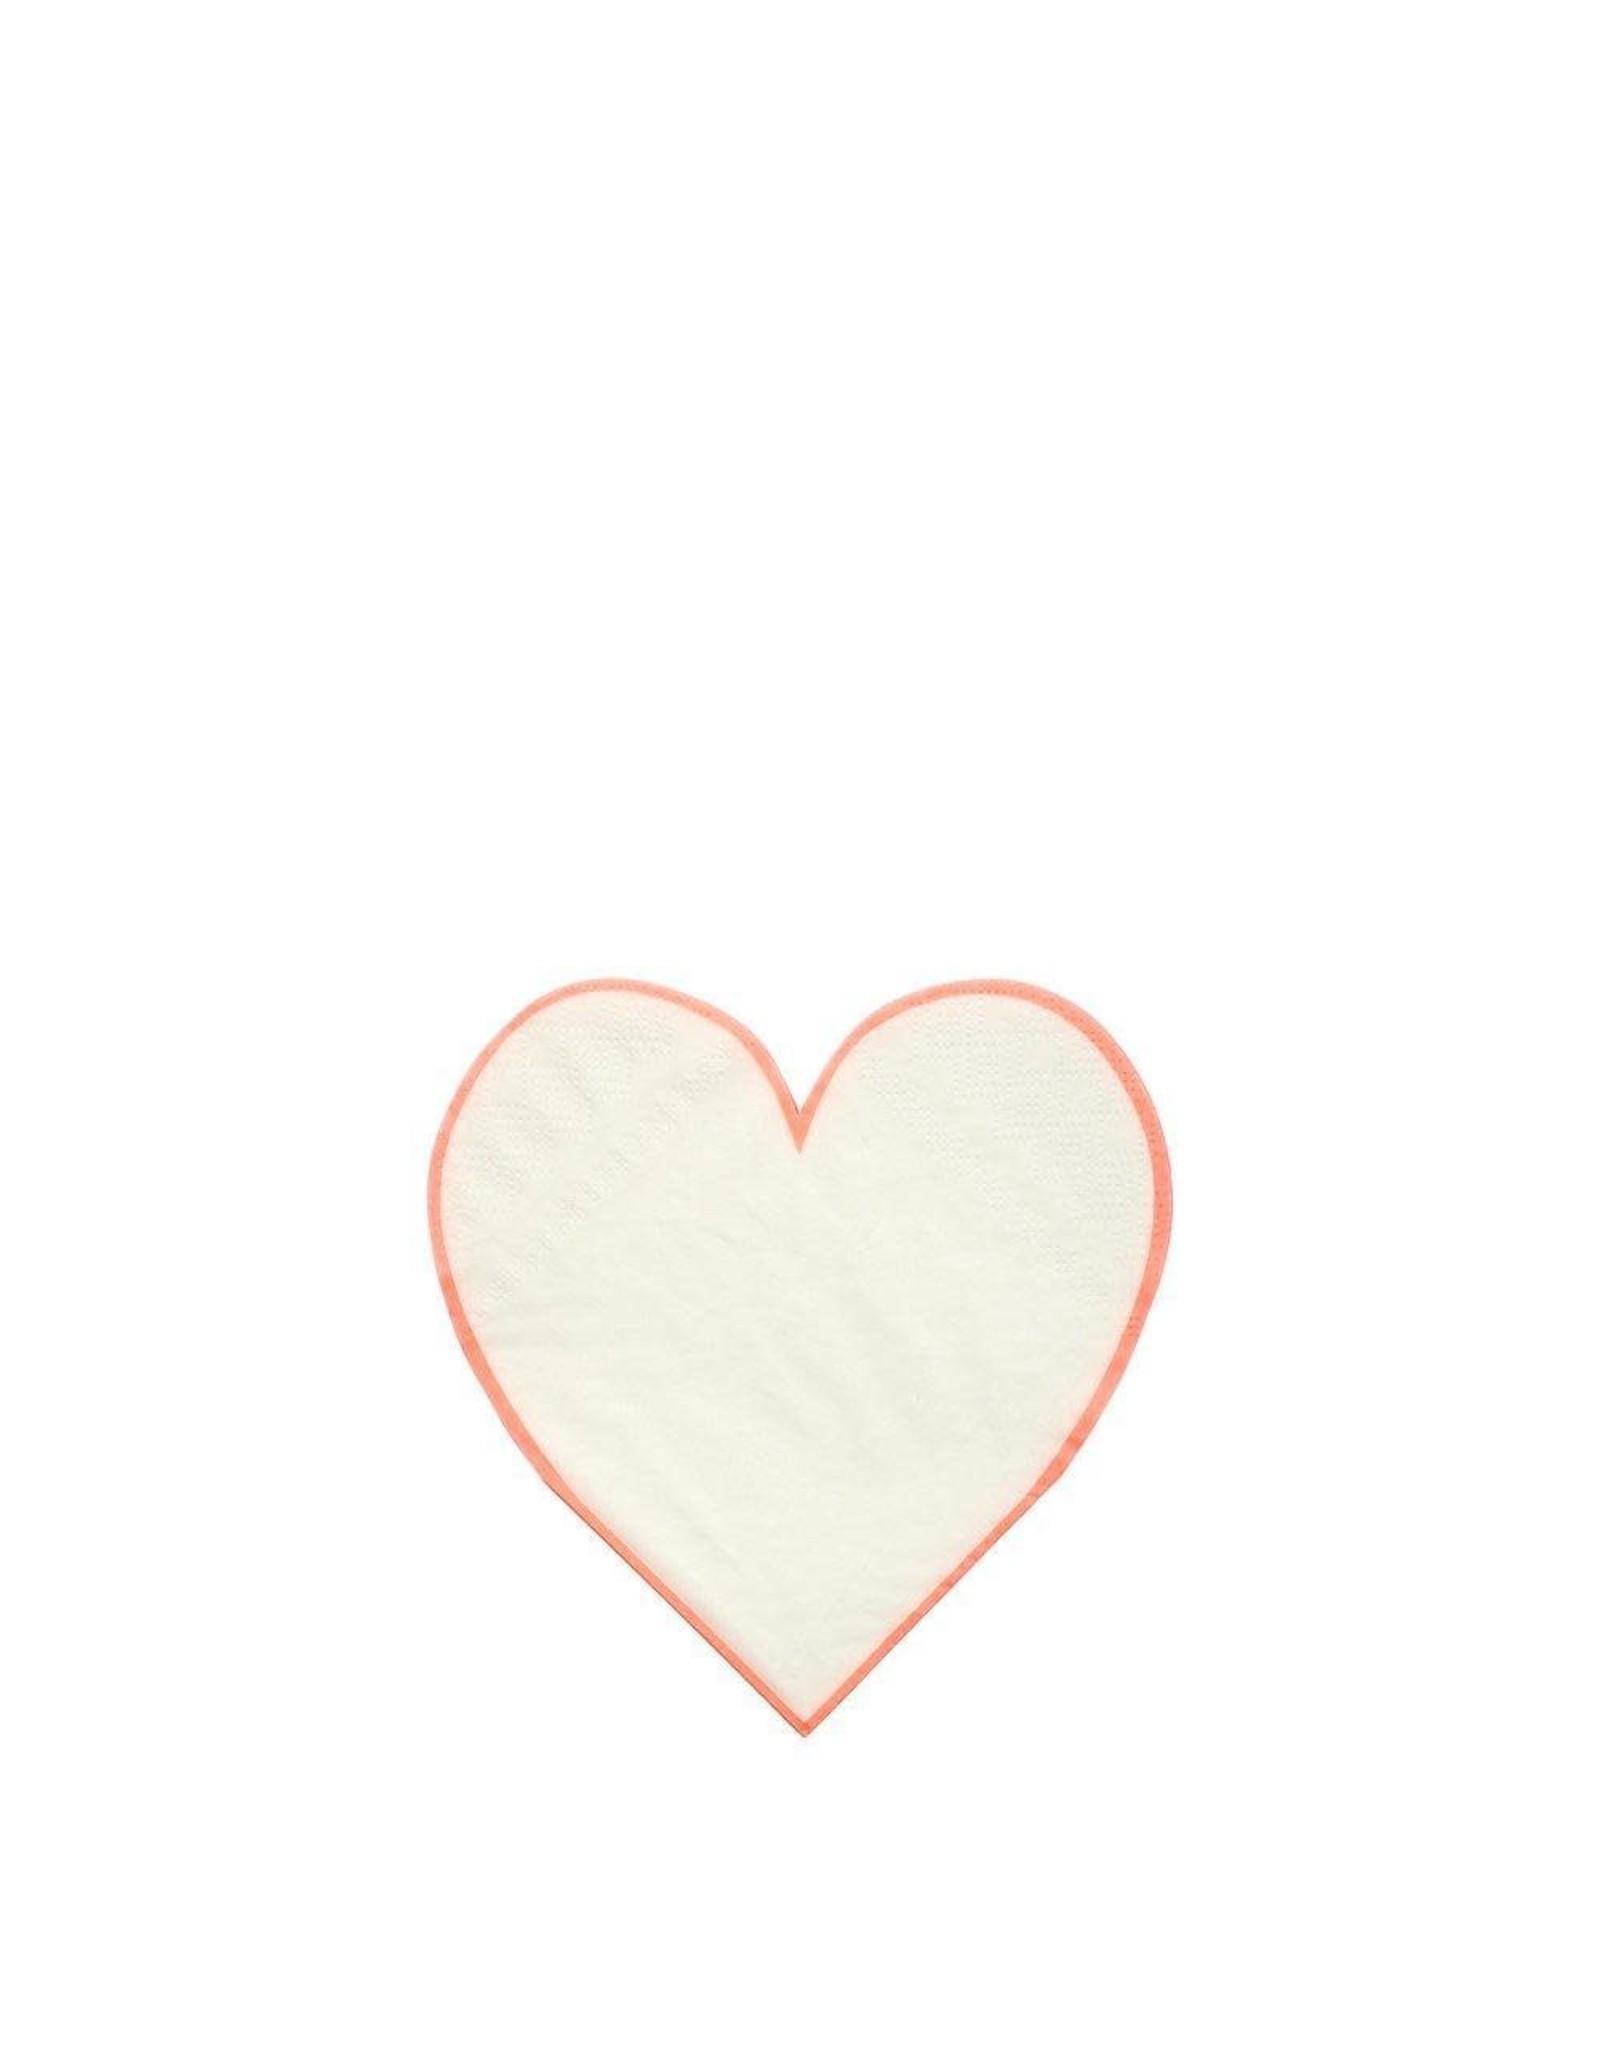 Meri Meri Serviettes | Hartje | 20st | 9 x 9 cm